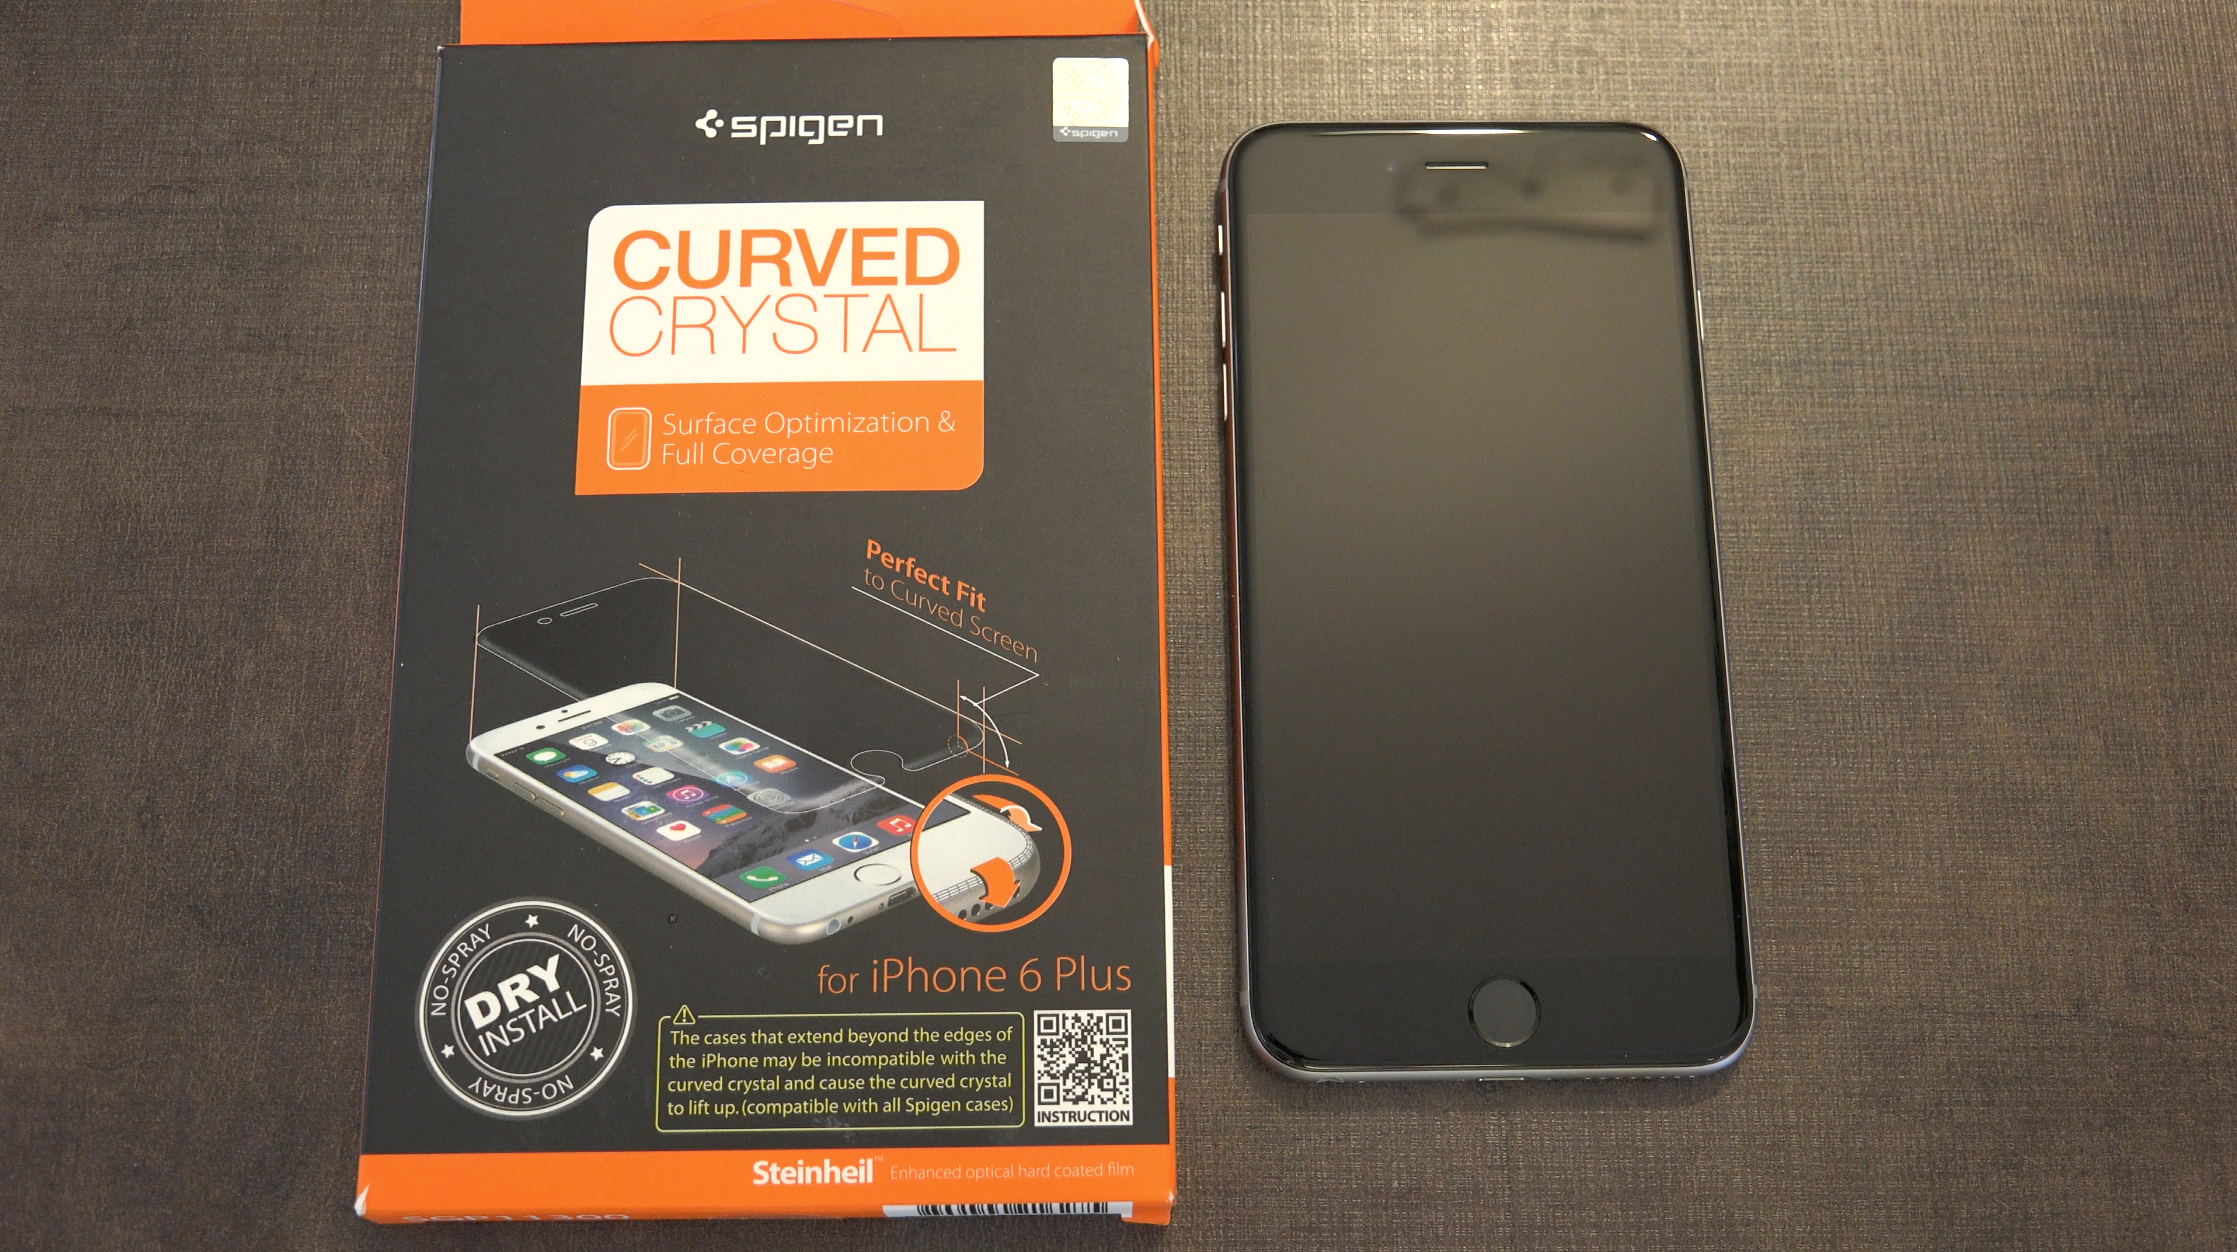 buy online db36a 8de9e Recensione: Spigen Curved Crystal per iPhone 6, una vera schifezza